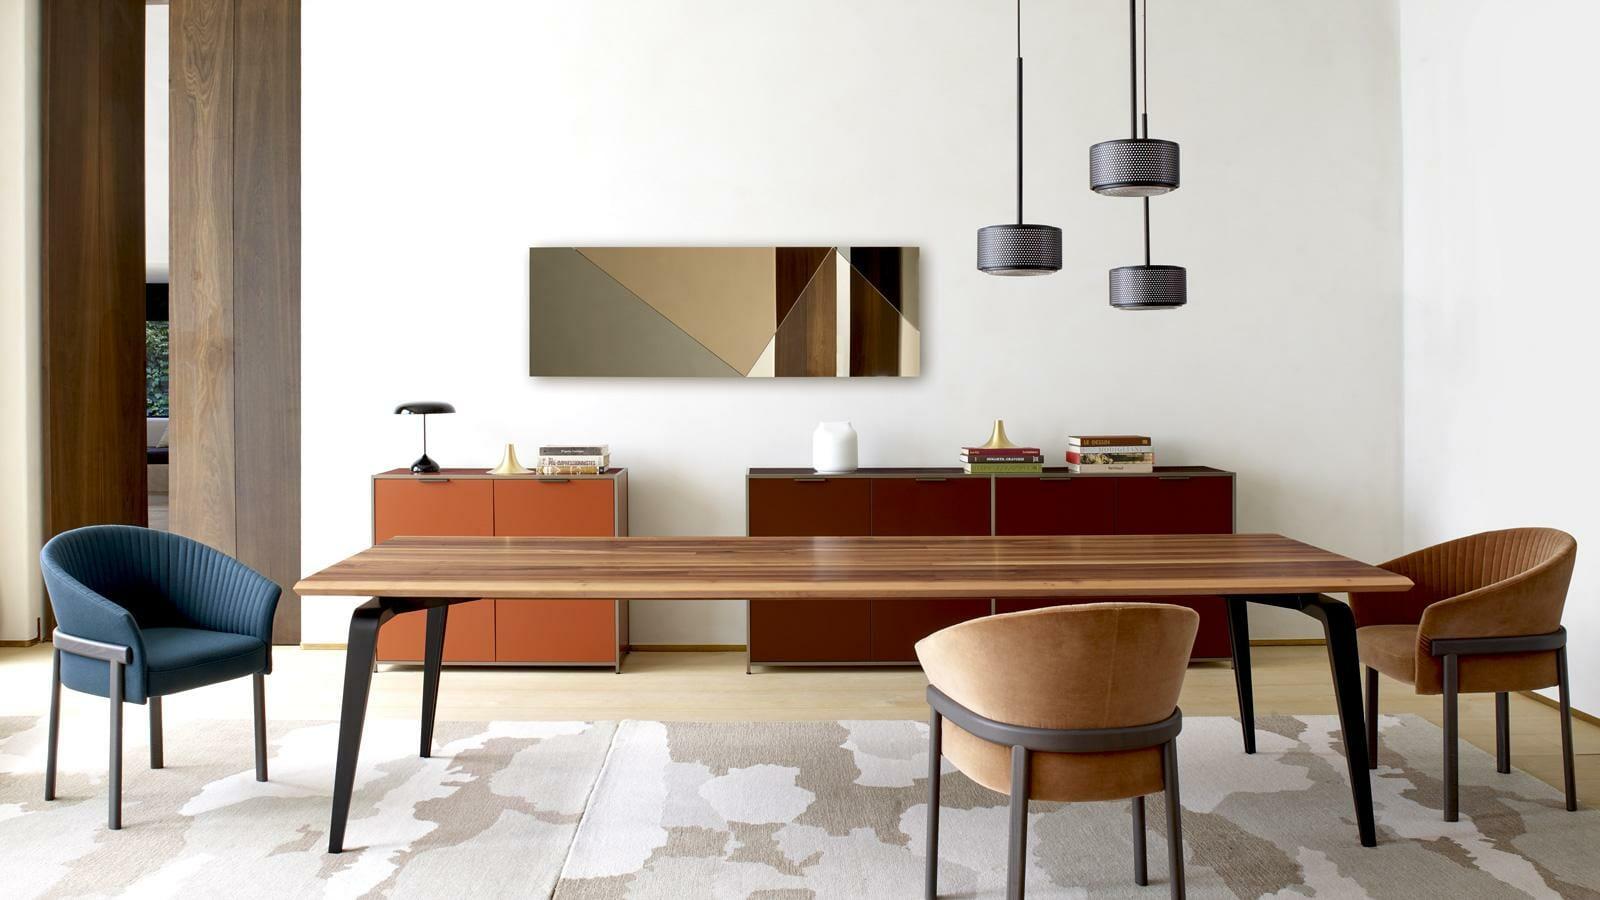 lignet rose - nest nyc furniture store